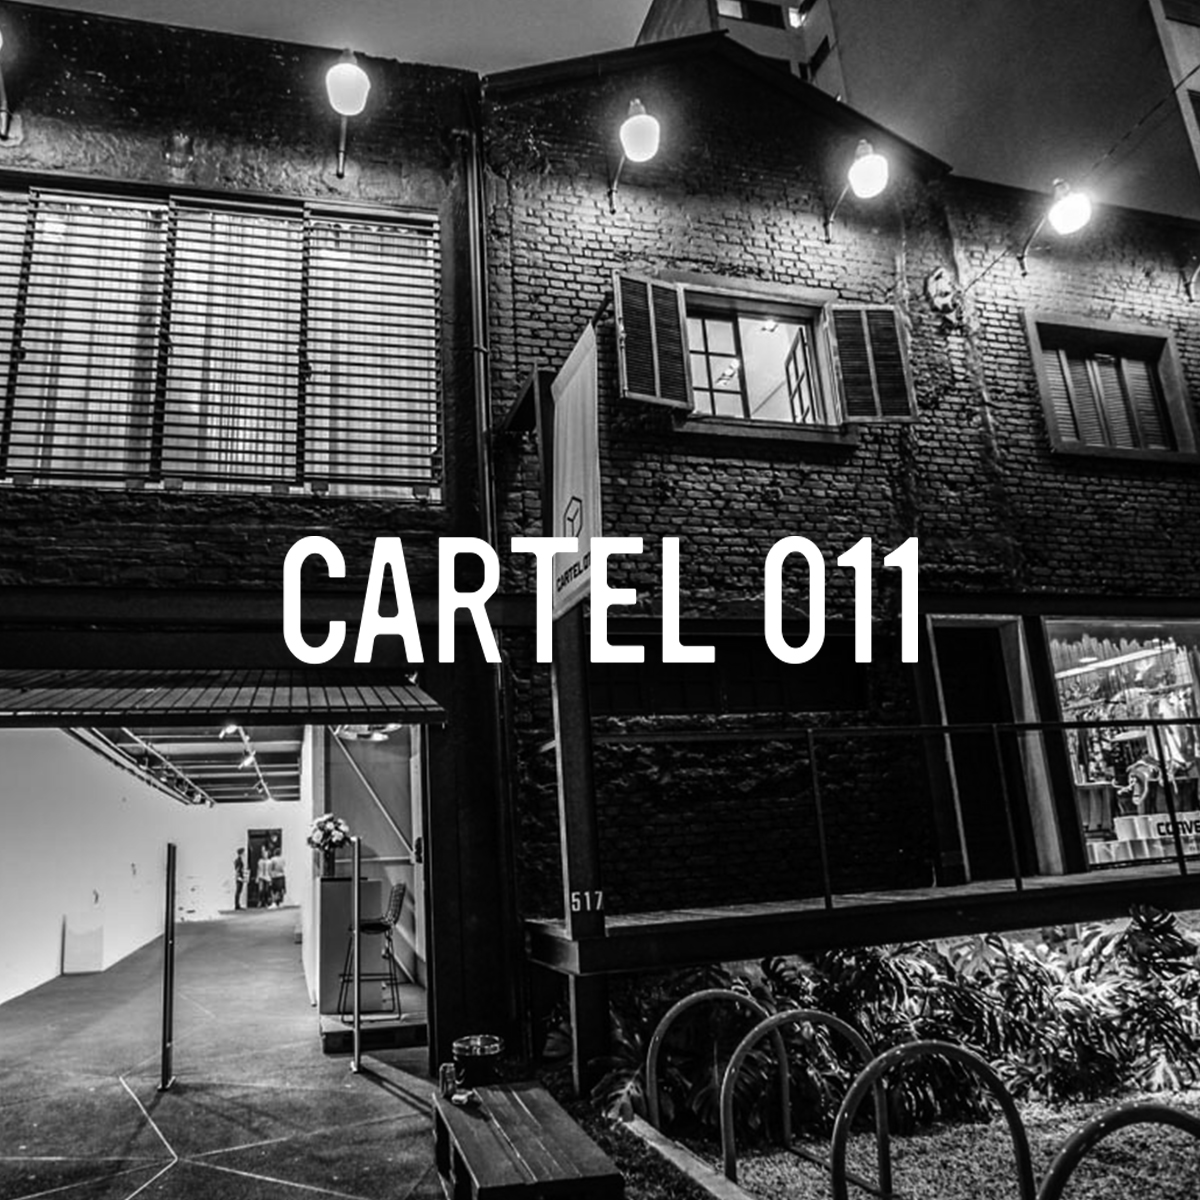 cartel 011.jpg